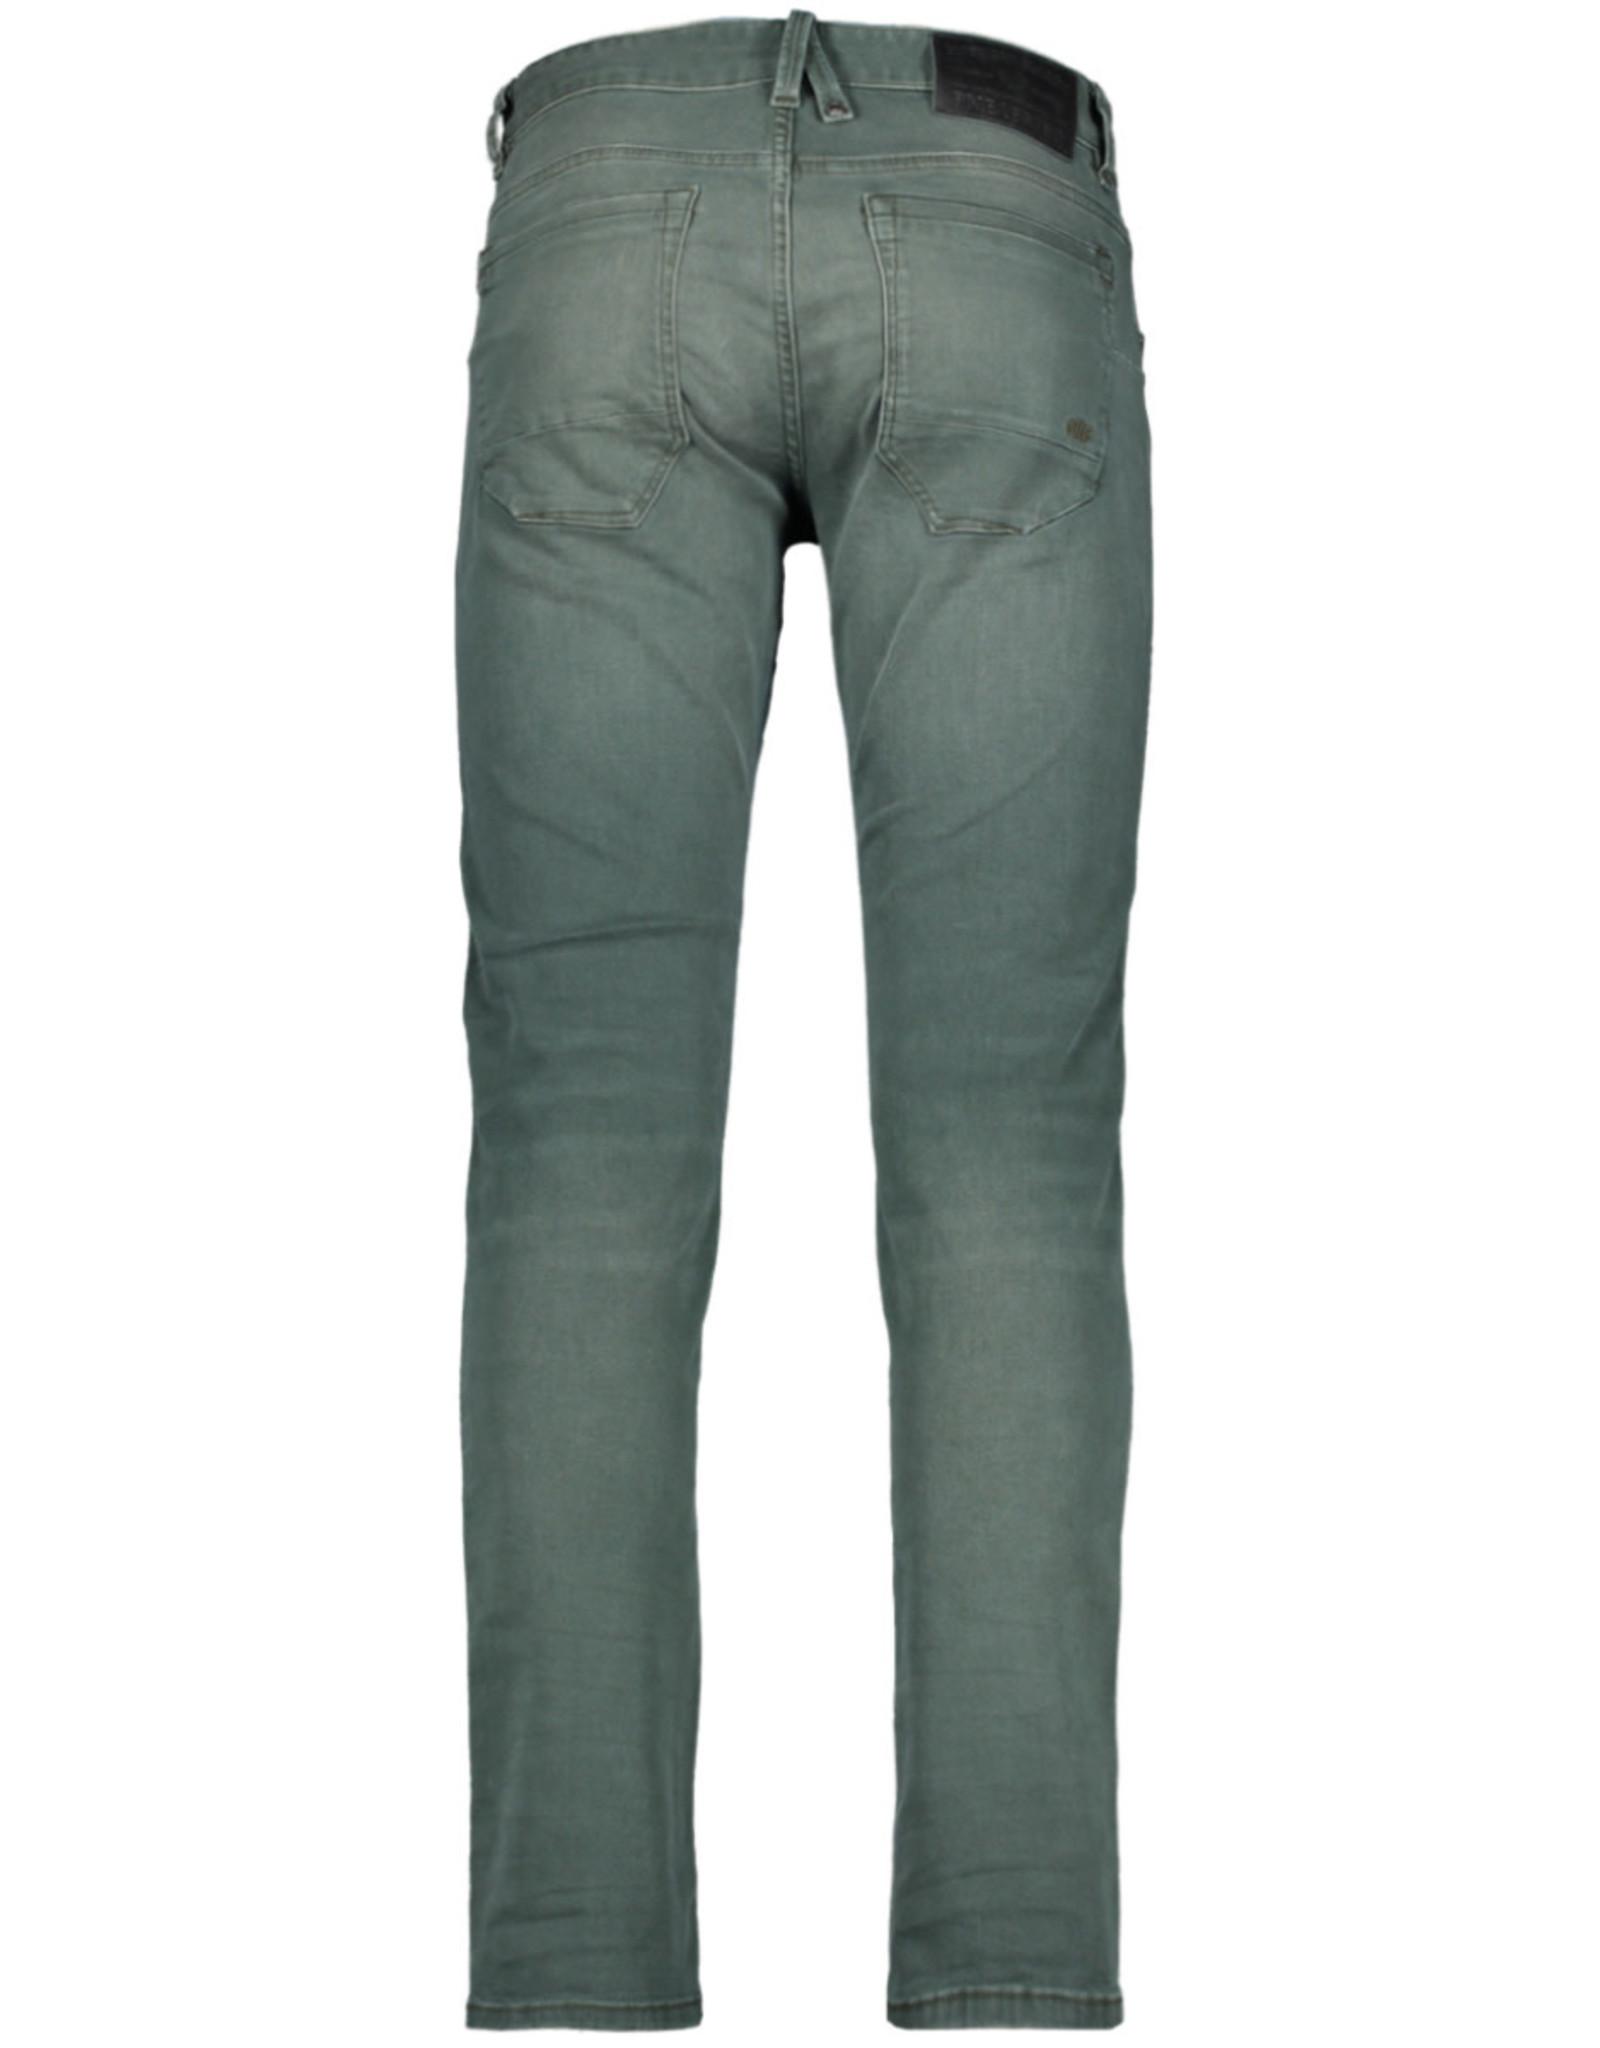 Pme Legend PME Legend Nightflight Jeans Broken twill 6416